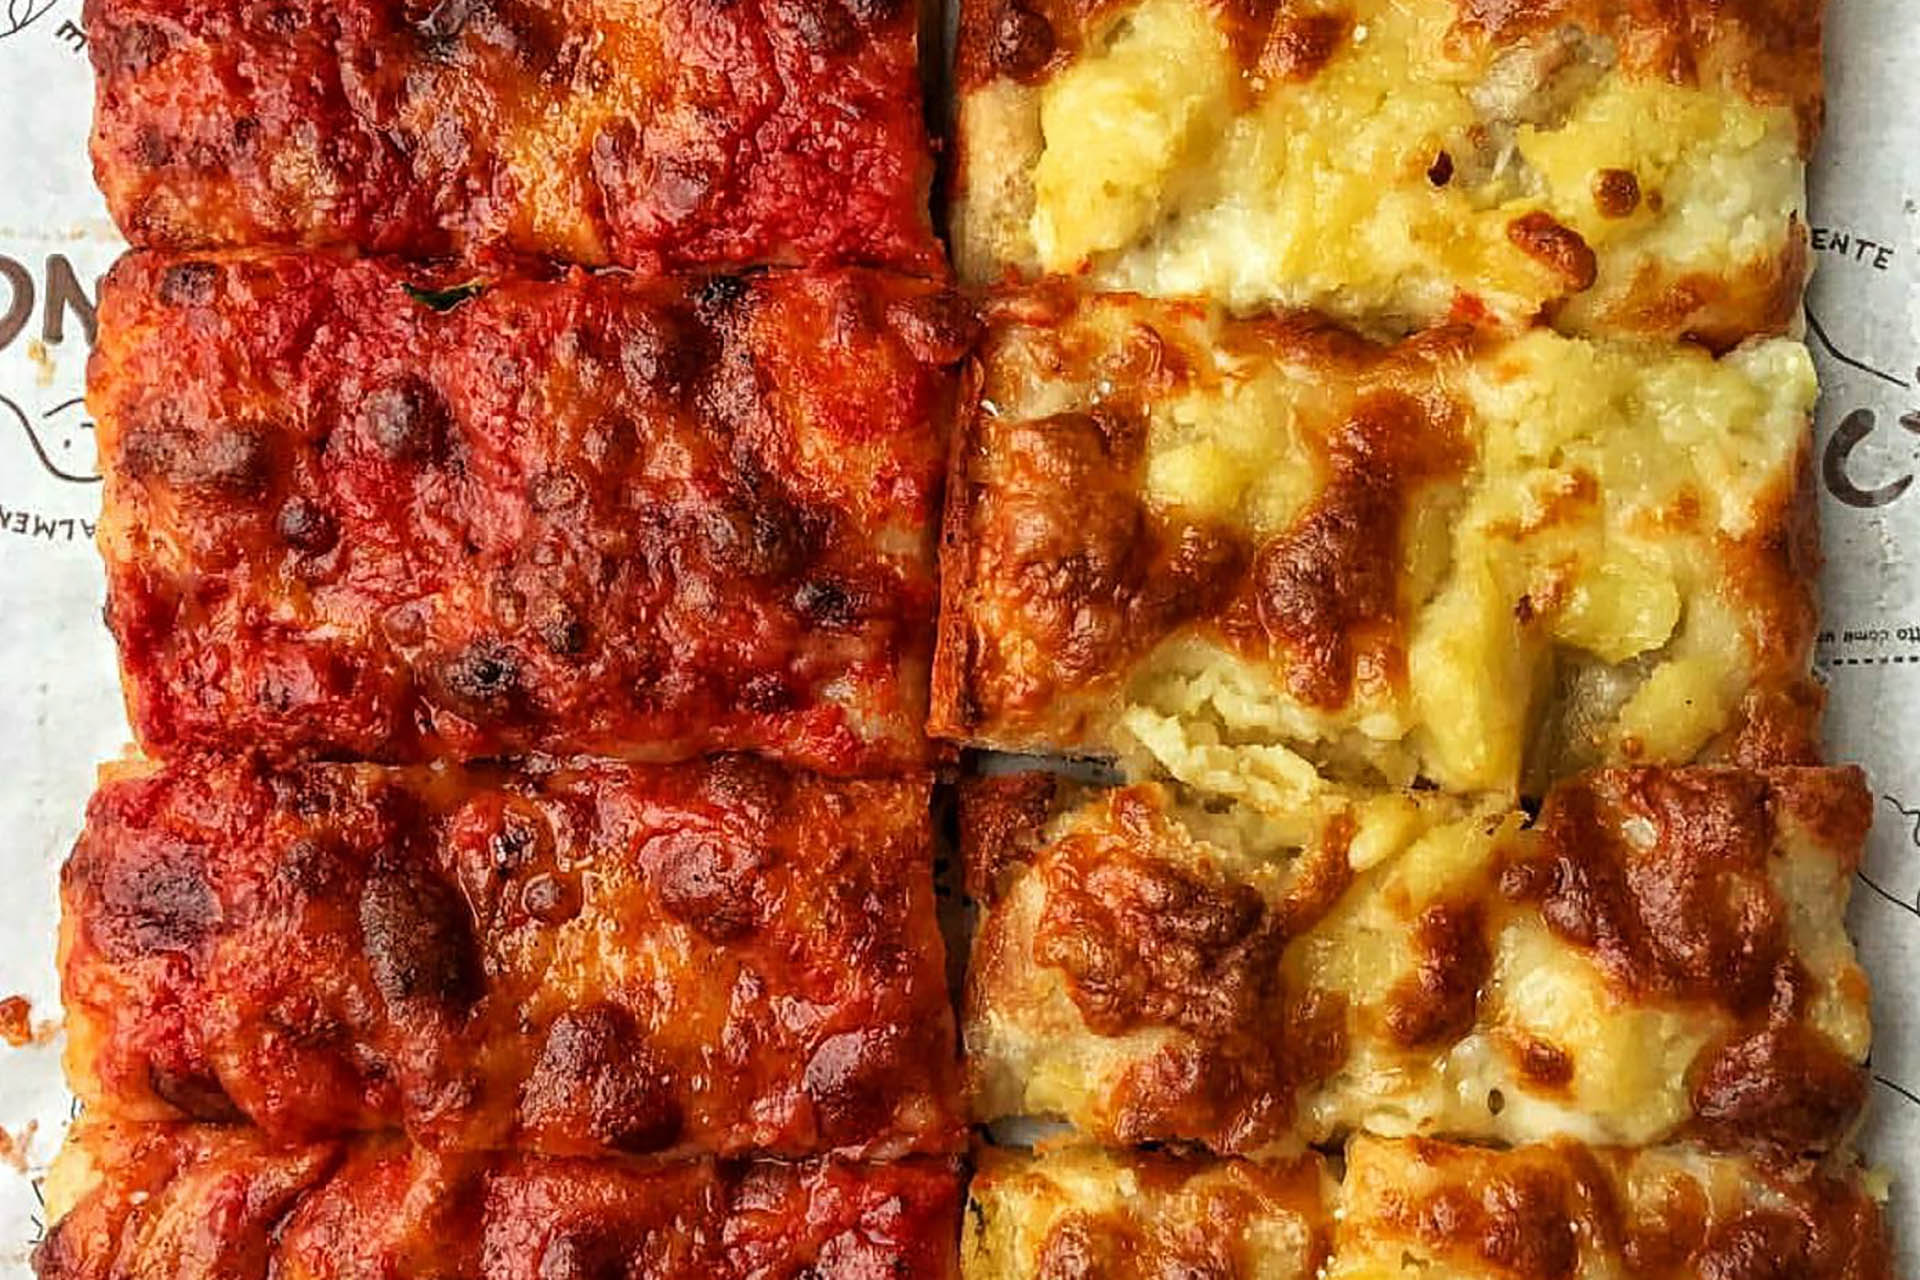 pizzarium bonci rome pizza restaurants vatican